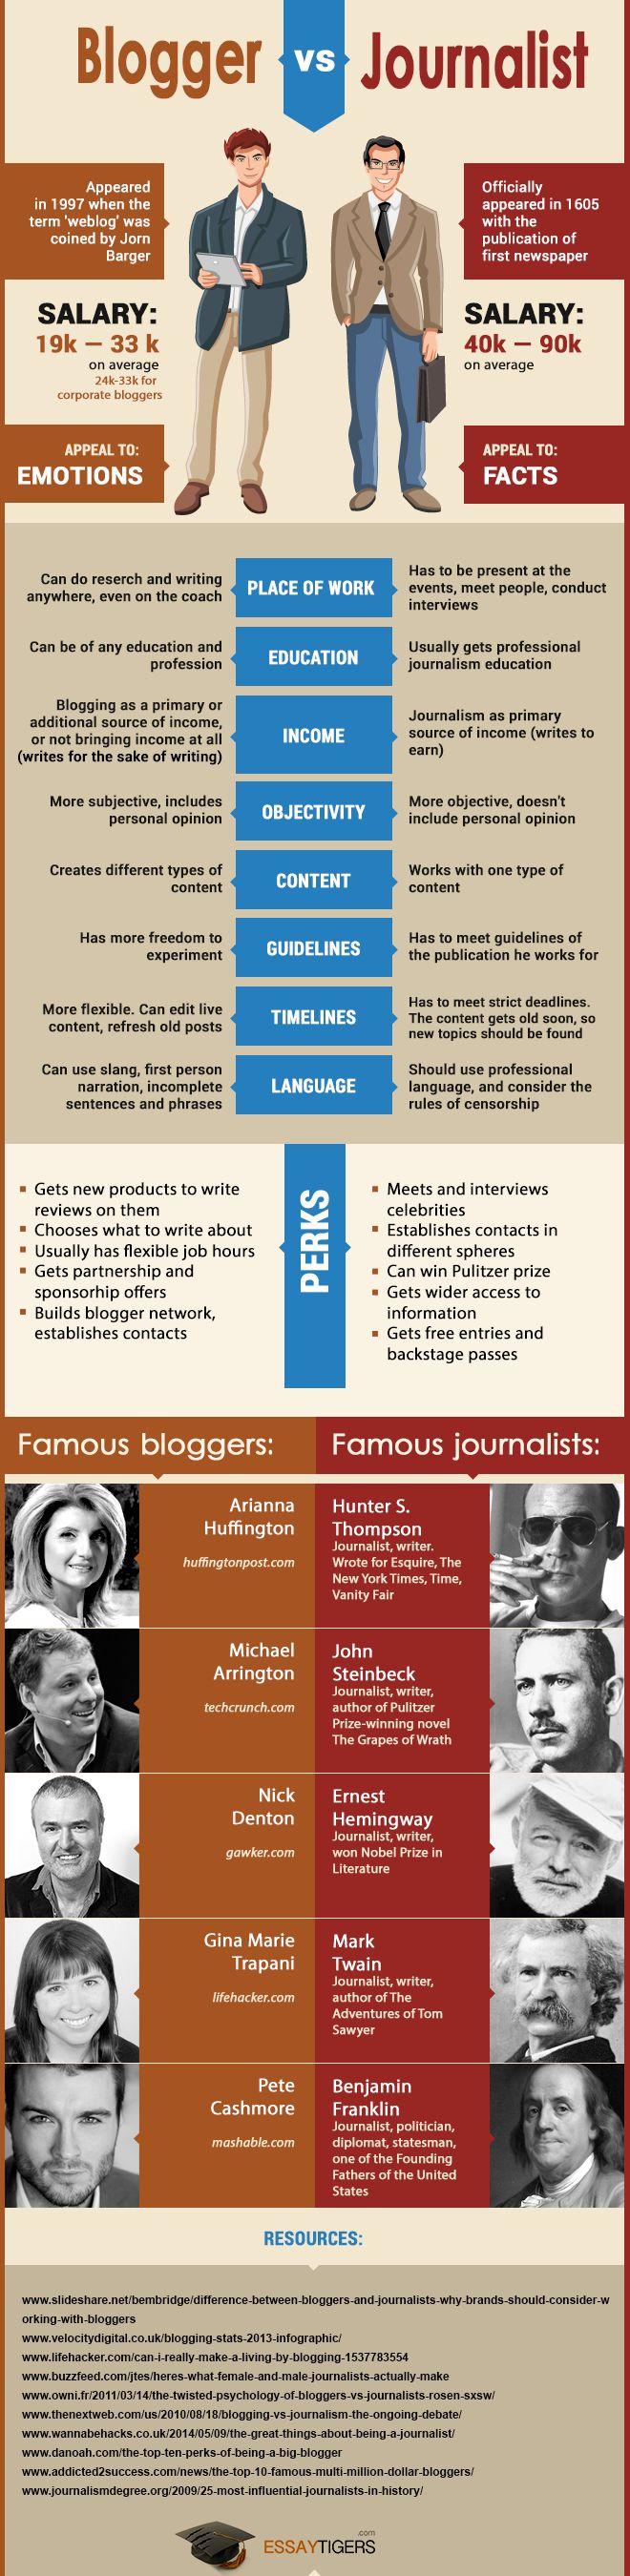 Blogger vs Journalist: The Ultimate Debate Solved